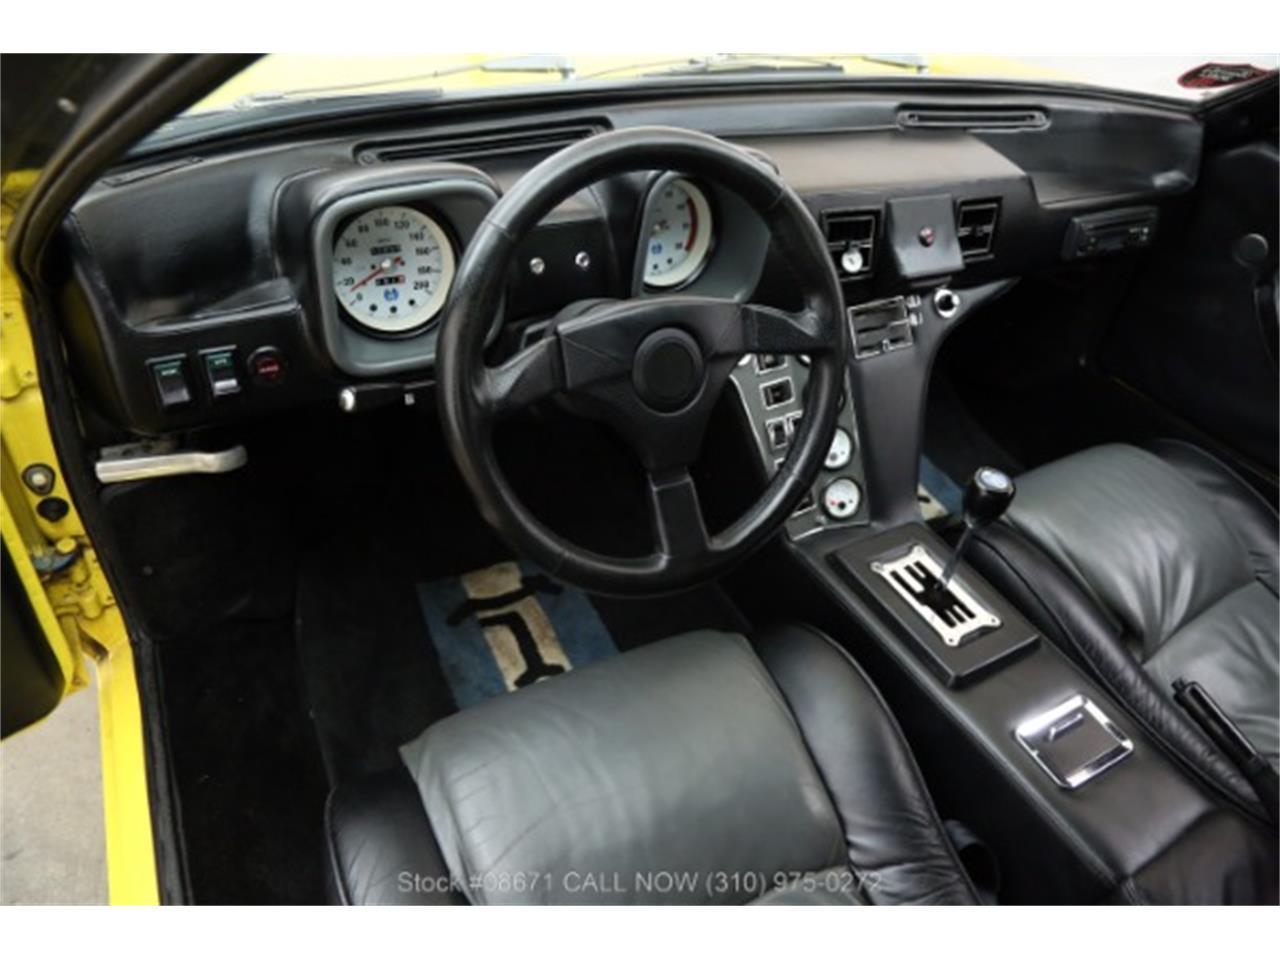 Large Picture of Classic 1972 De Tomaso Pantera - $79,500.00 - LTS7